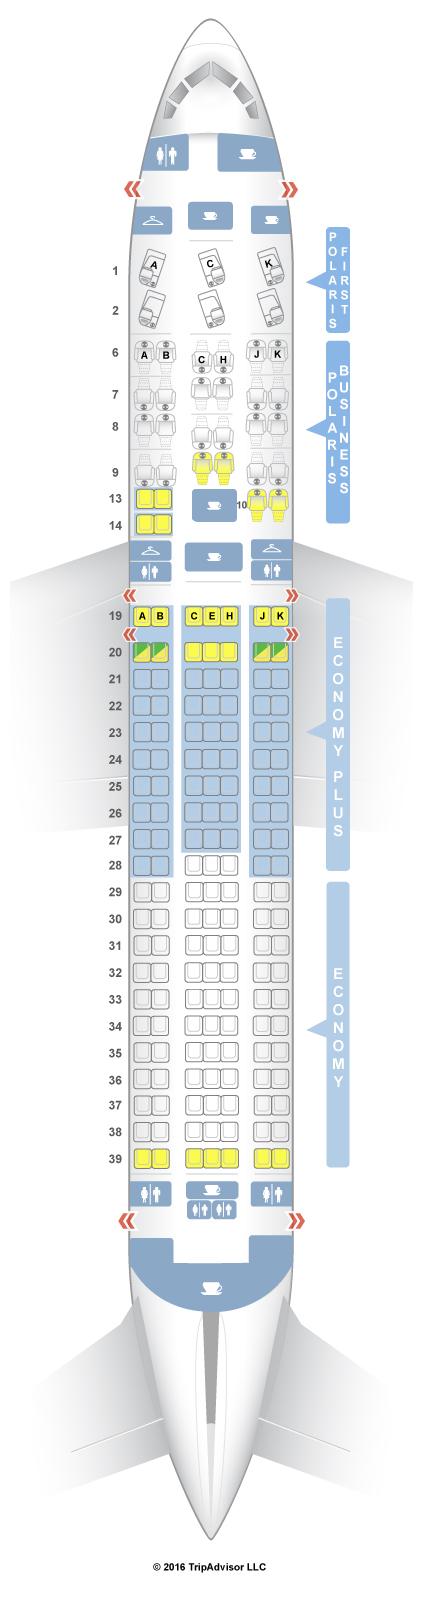 seatguru seat map united boeing 767 300er 76l three class